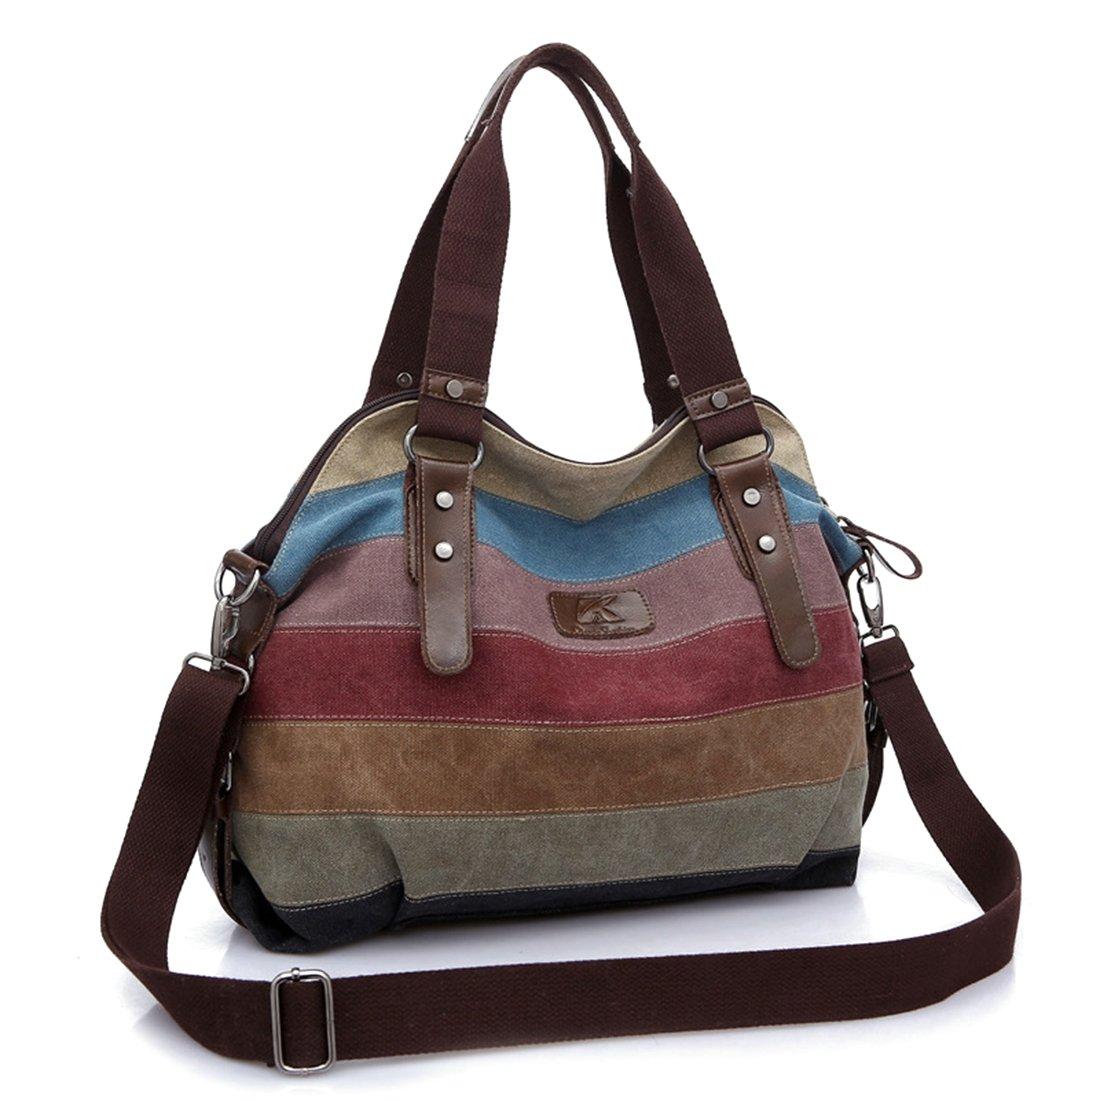 Women Work Casual Shopping Handle Shoulder Bags Canvas Totes Handbag Striped Hobos Cross Body Bag